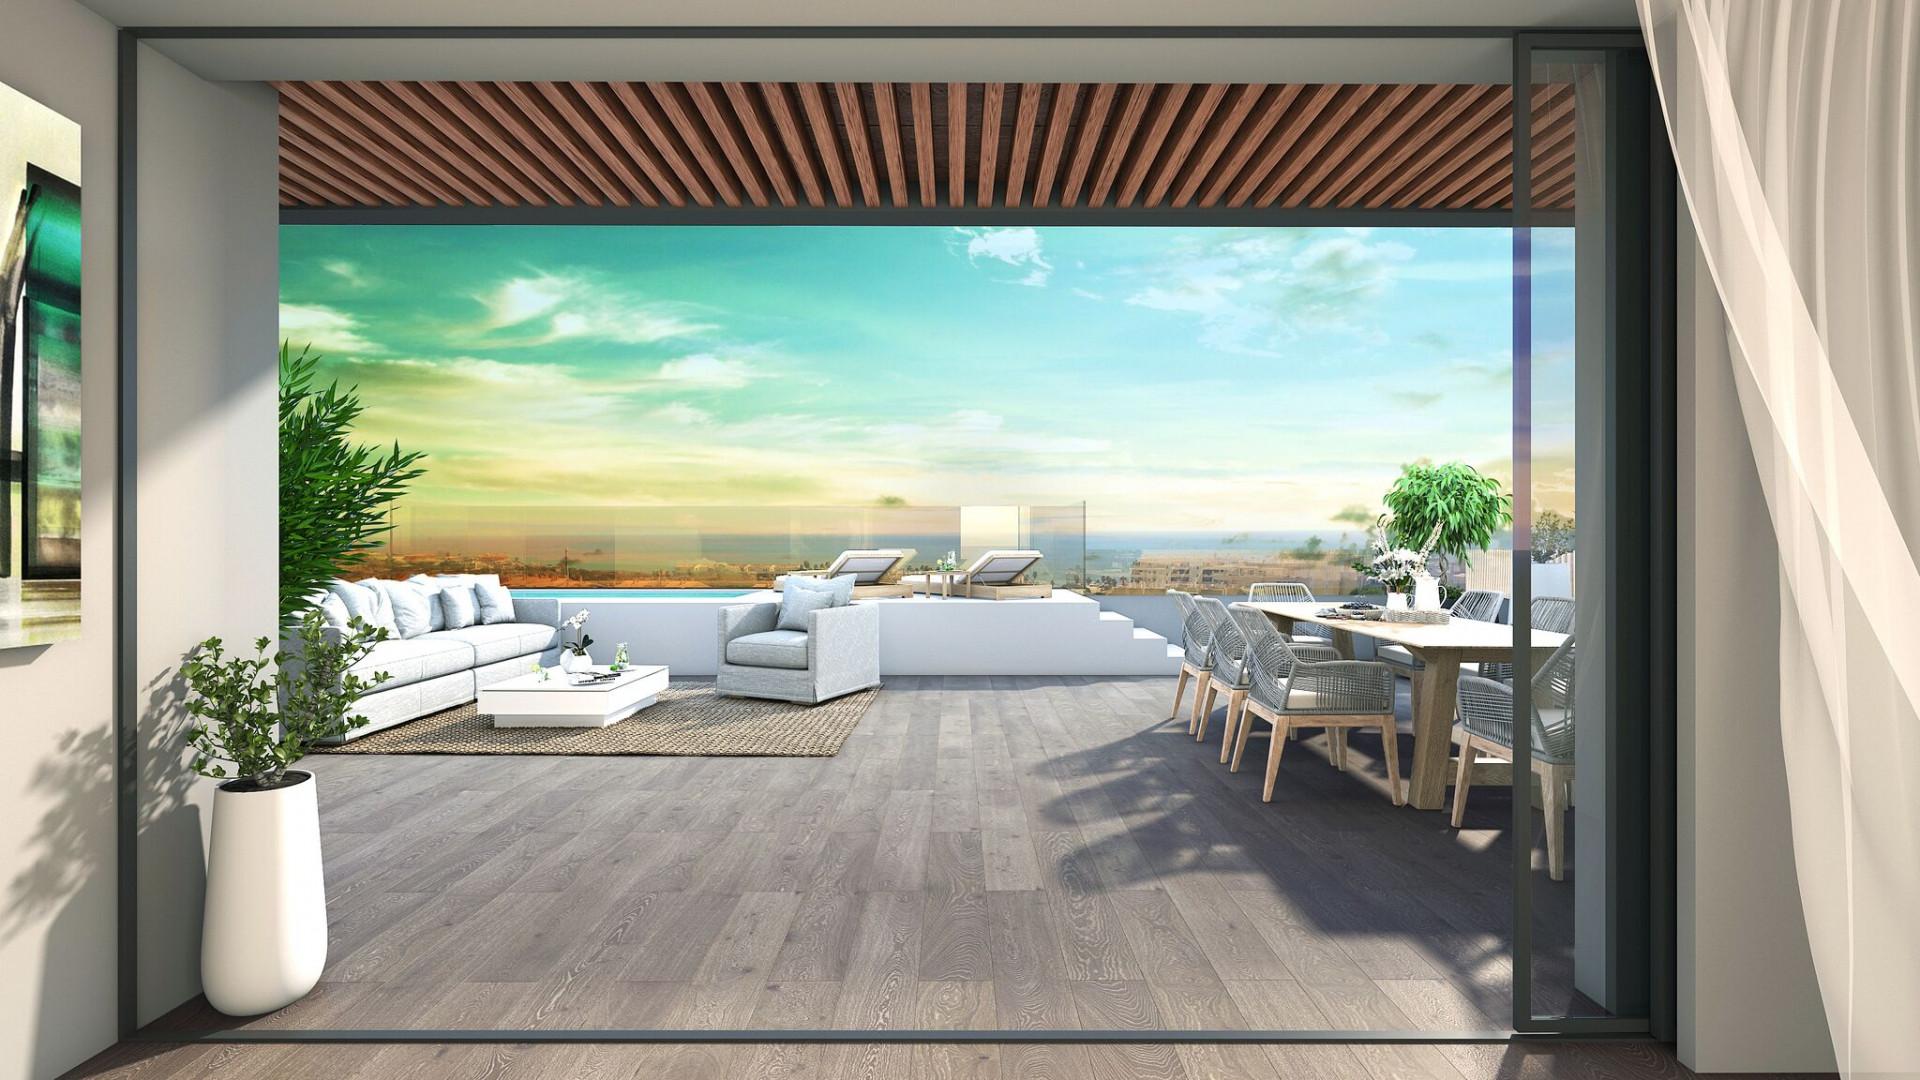 Nieuwe appartementen La Cala de Mijas costa del sol